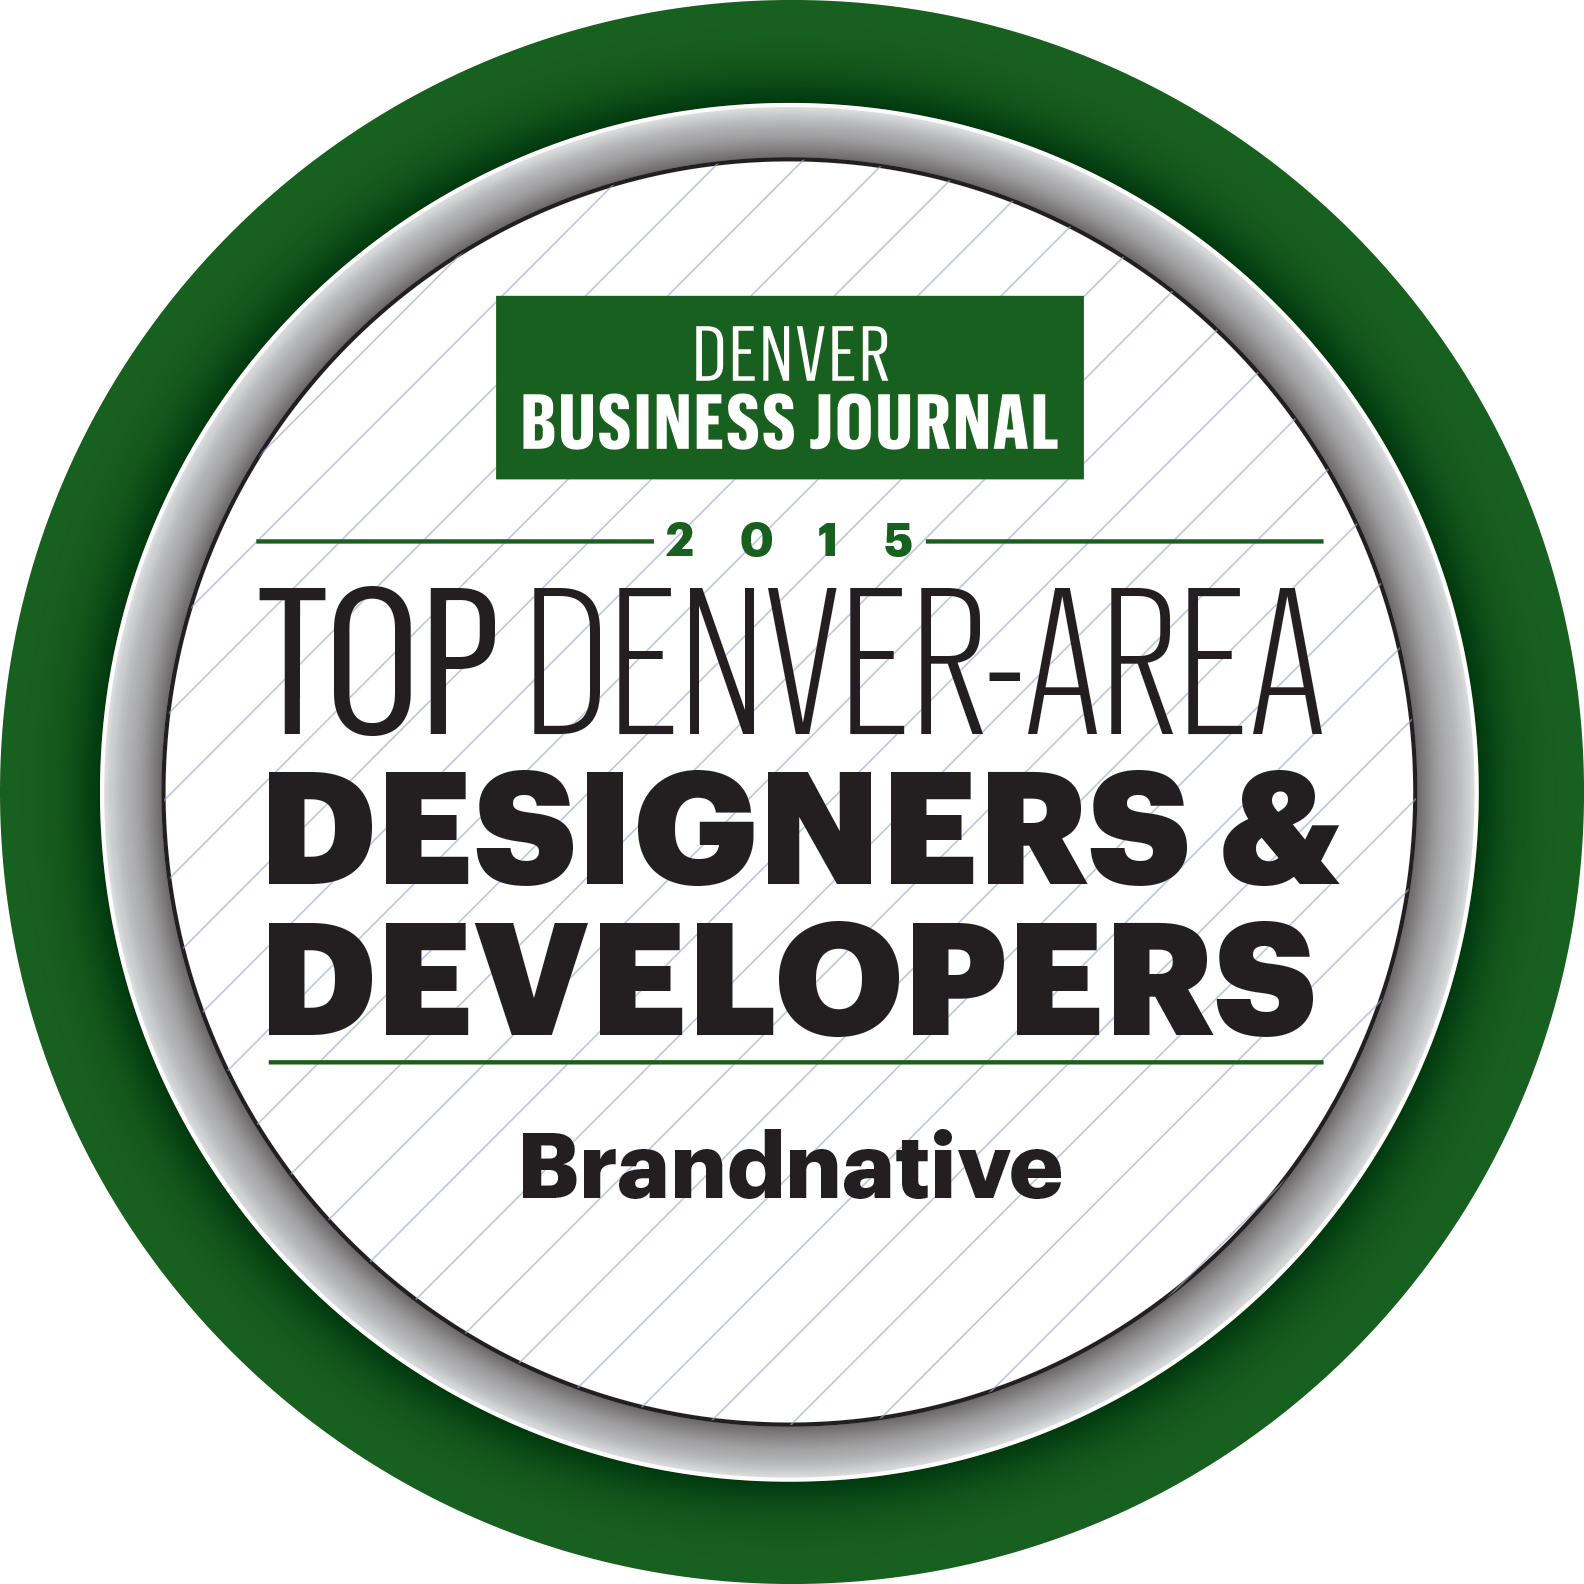 Denver Business Journal News: Brandnative Recognized As A 2015 Top Denver Web Design